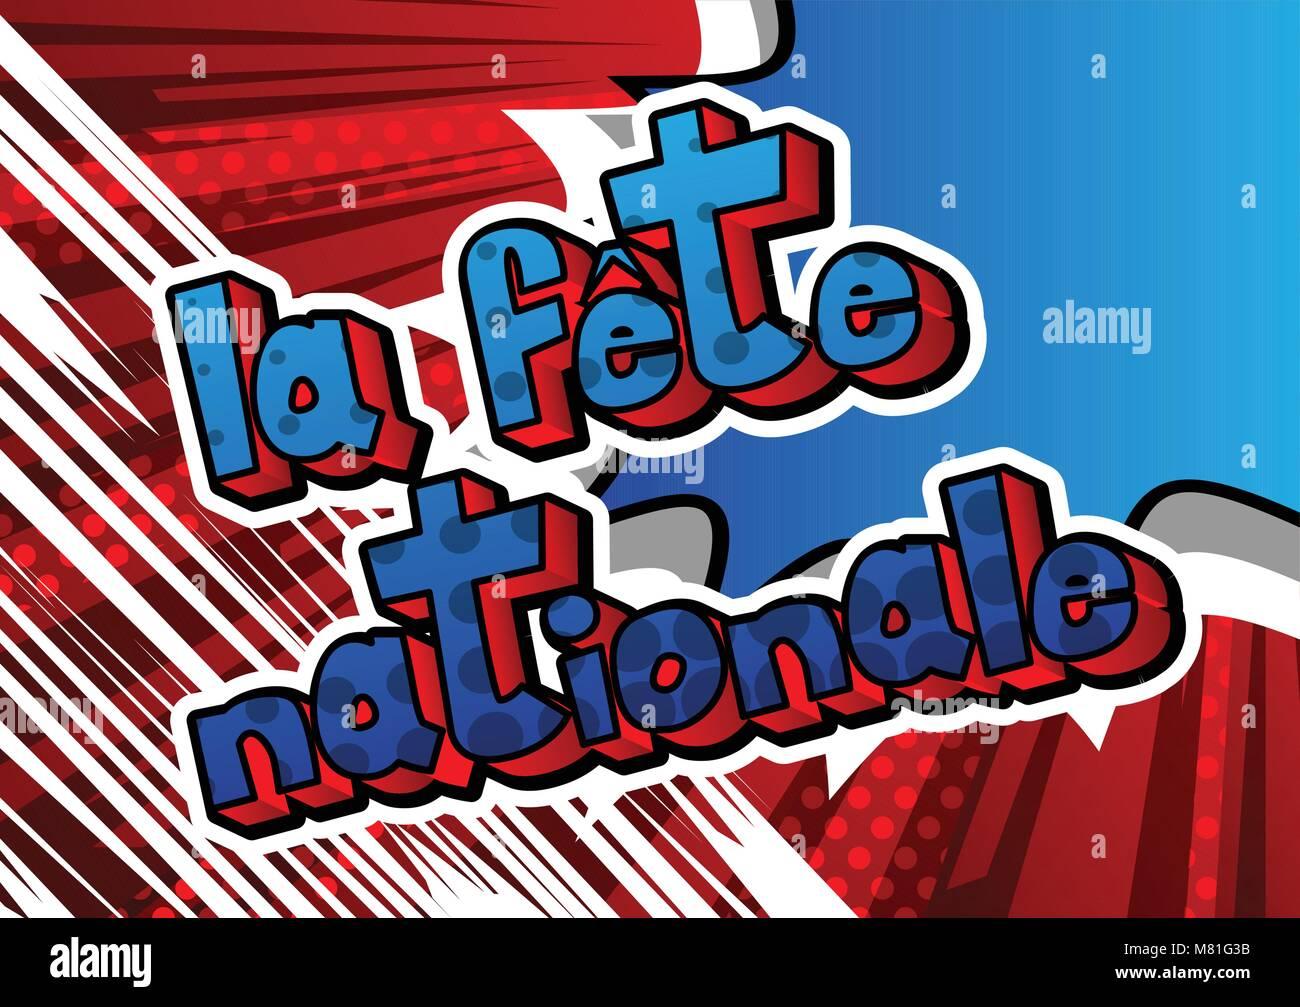 Vector illustrated banner greeting card or poster for bastille day vector illustrated banner greeting card or poster for bastille day in french fete nationale bastille day m4hsunfo